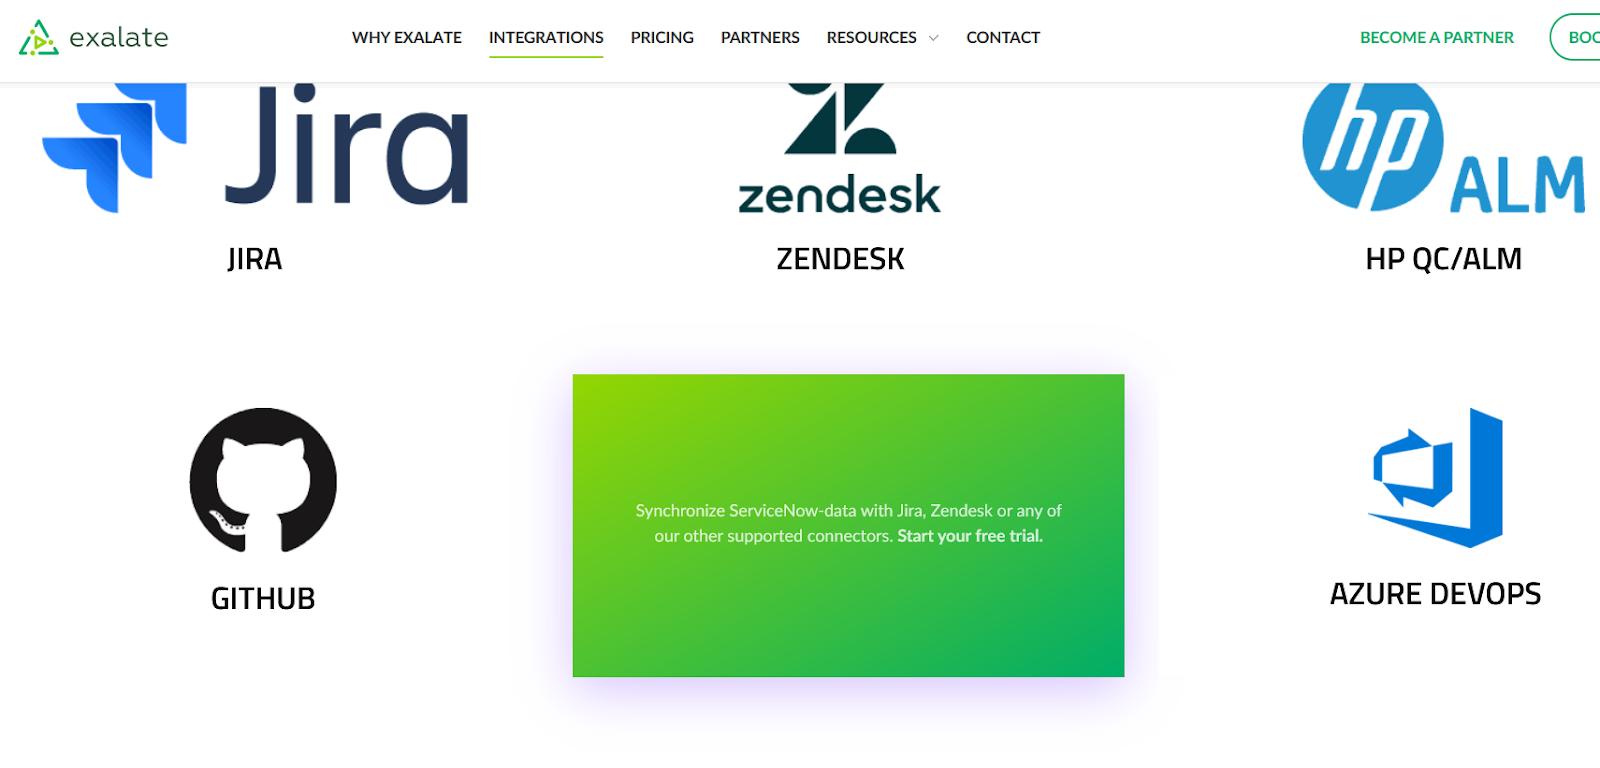 exalate for ServiceNow Azure DevOps integration